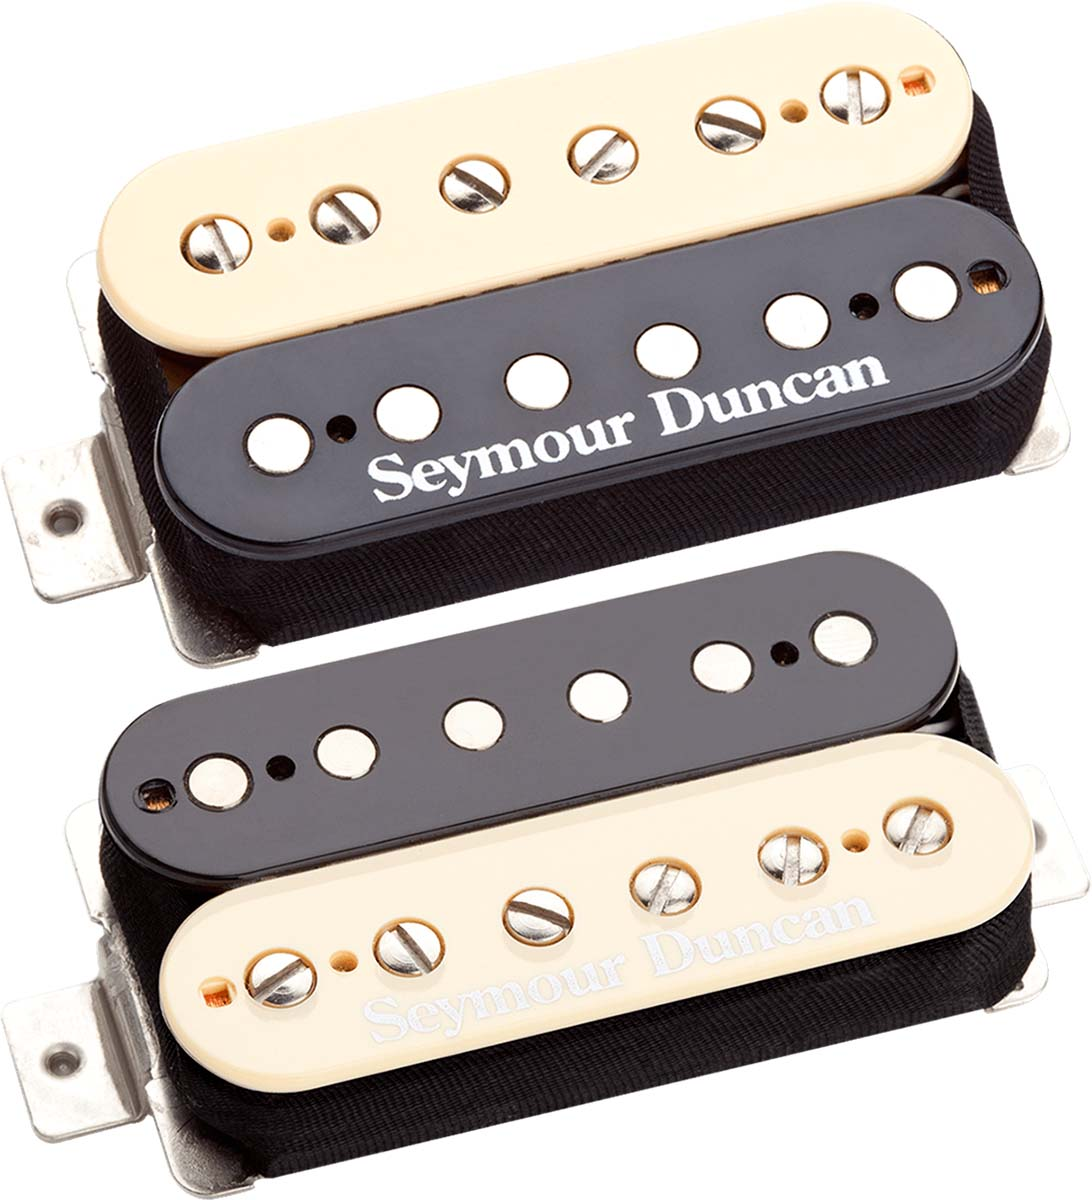 Seymour Duncan SH-2N Jazz Model Pickup Black//Cream